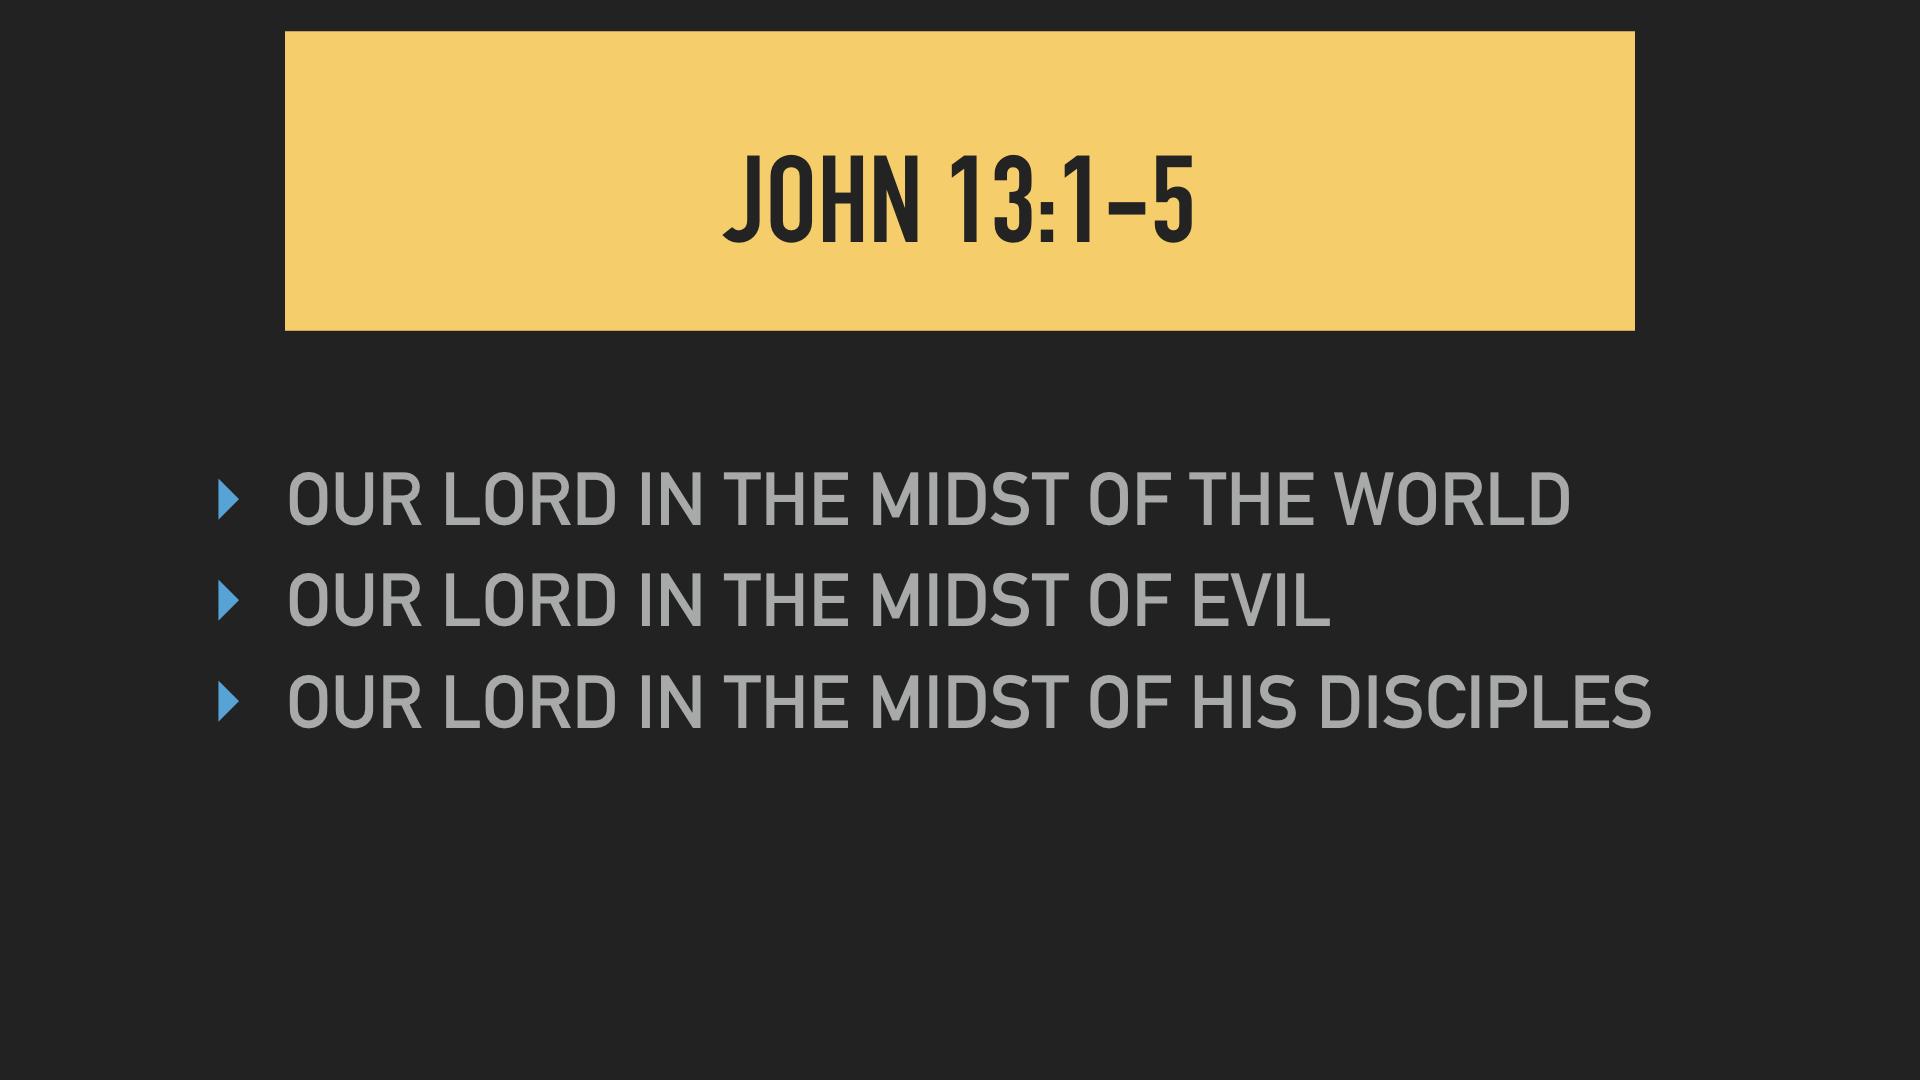 John 13:1-5.002.jpeg